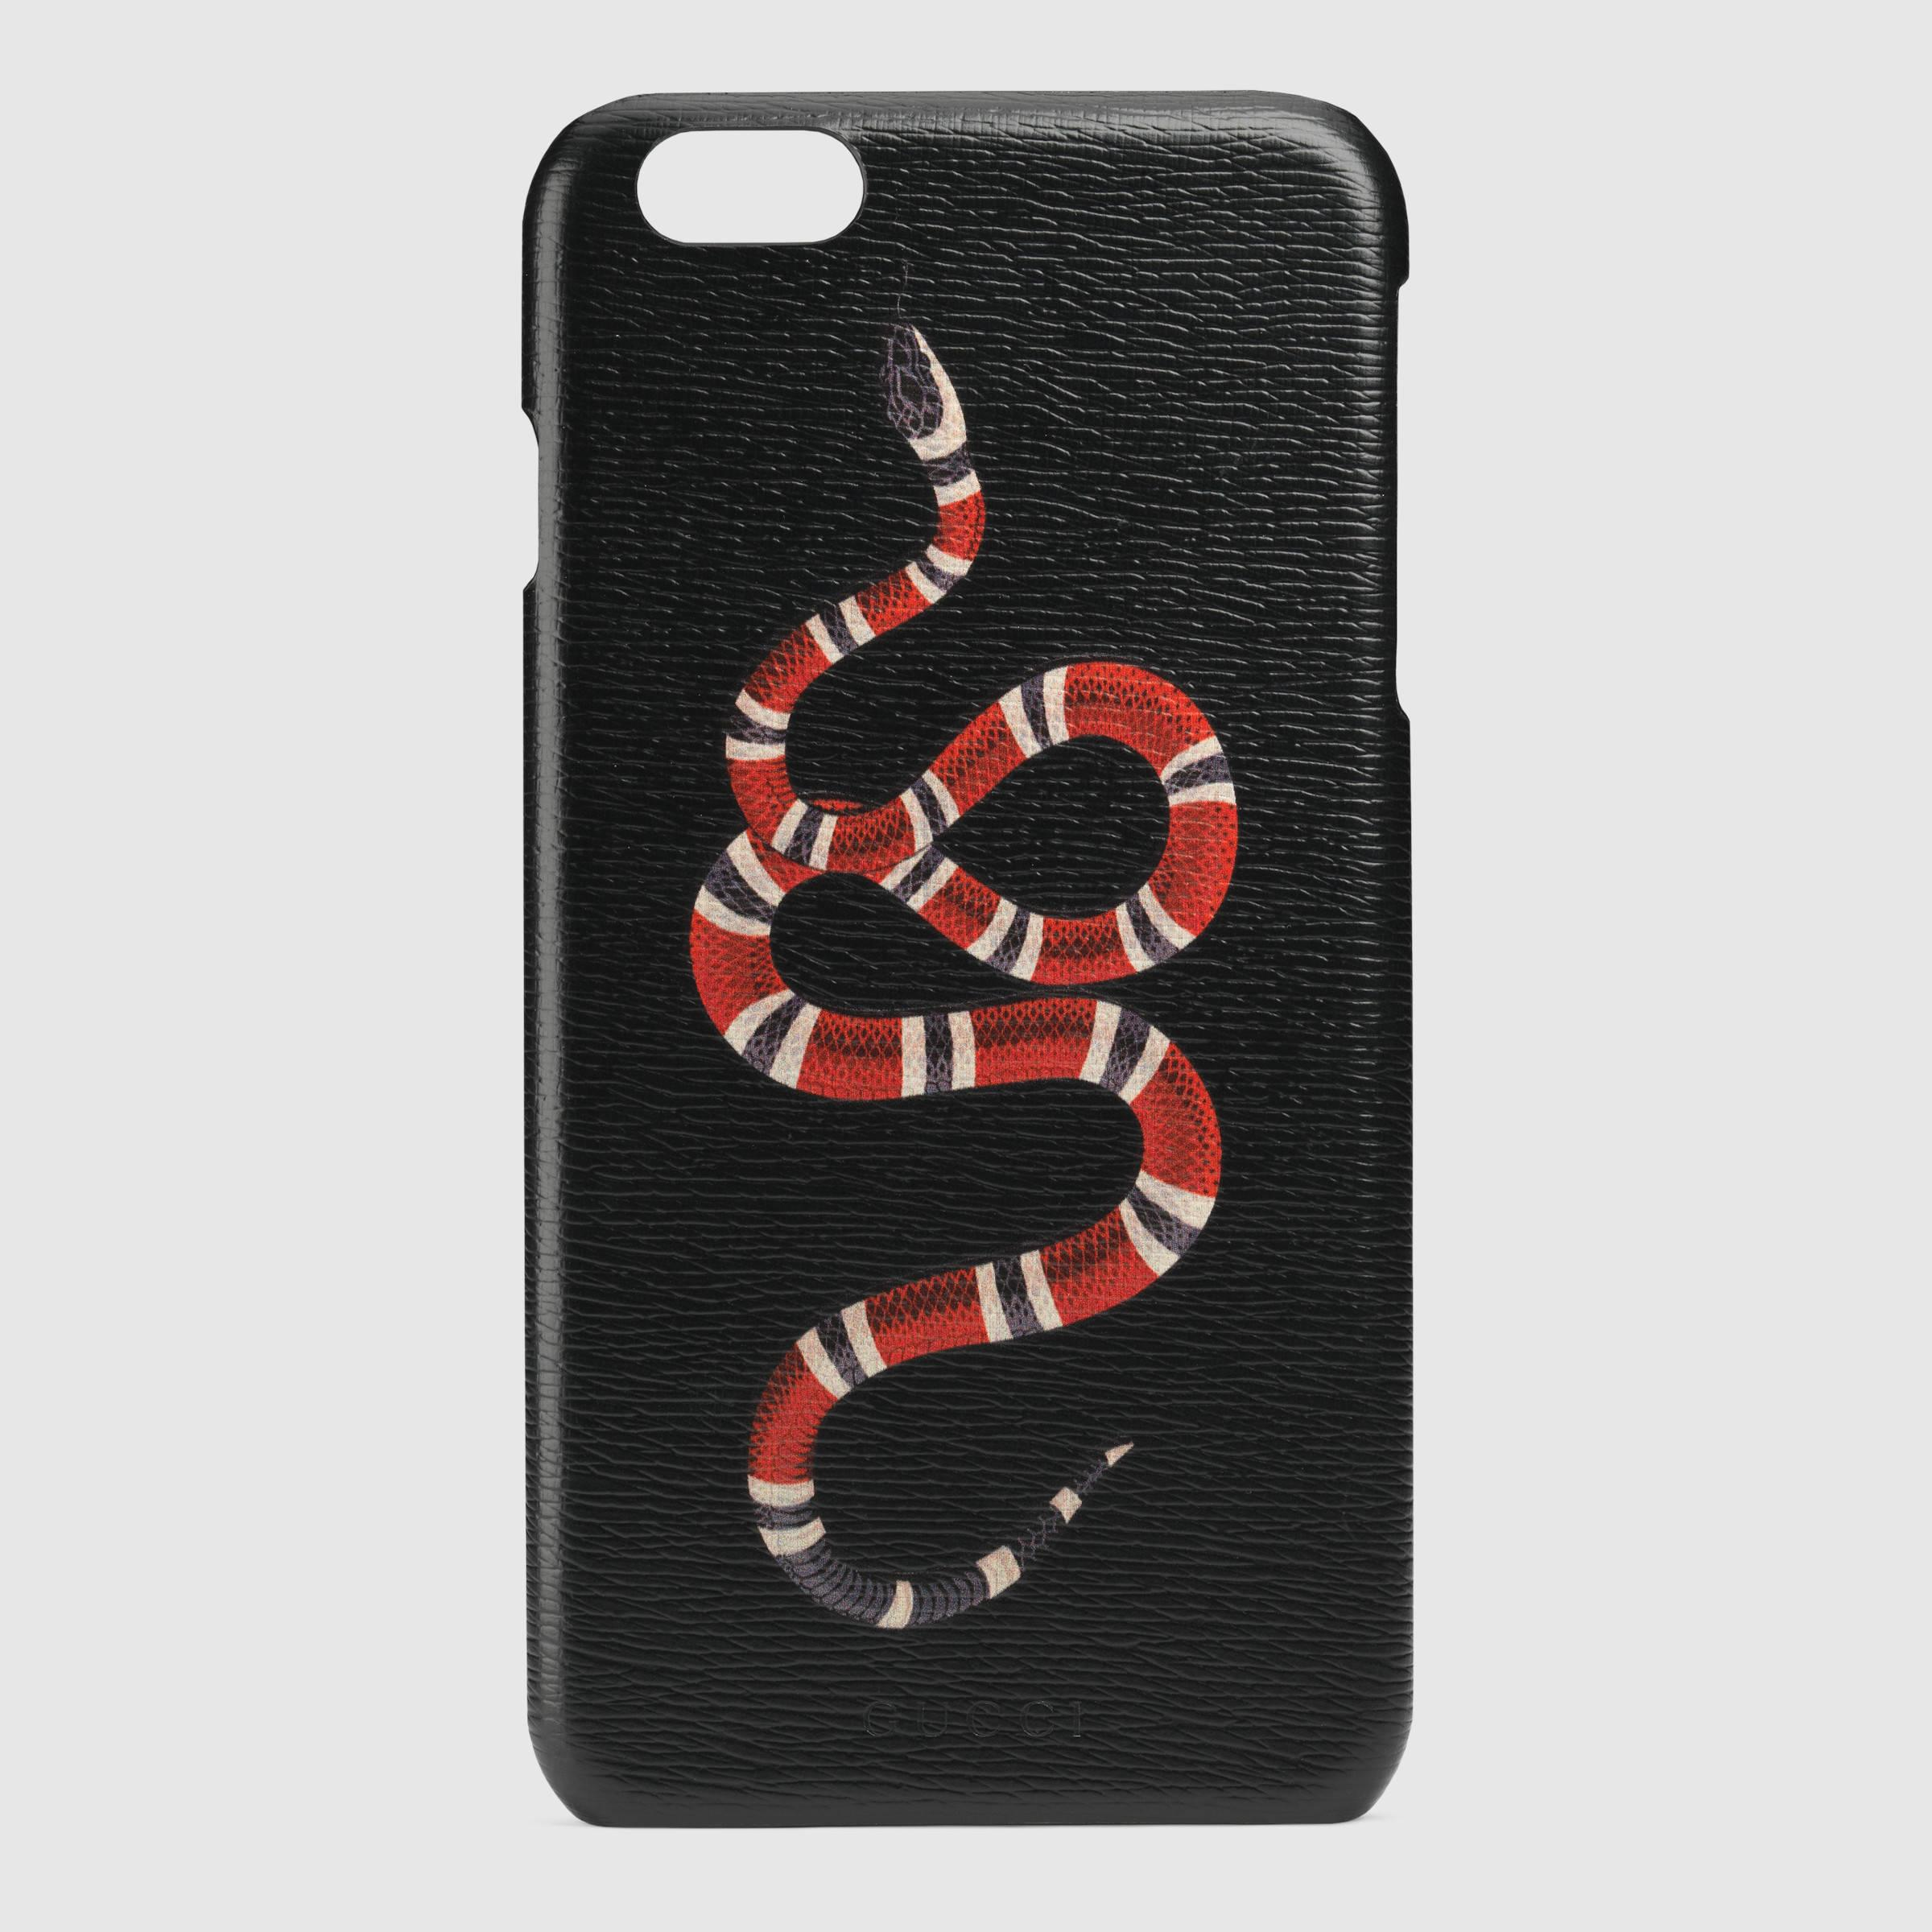 Gucci snake print iphone 6 plus case in black lyst